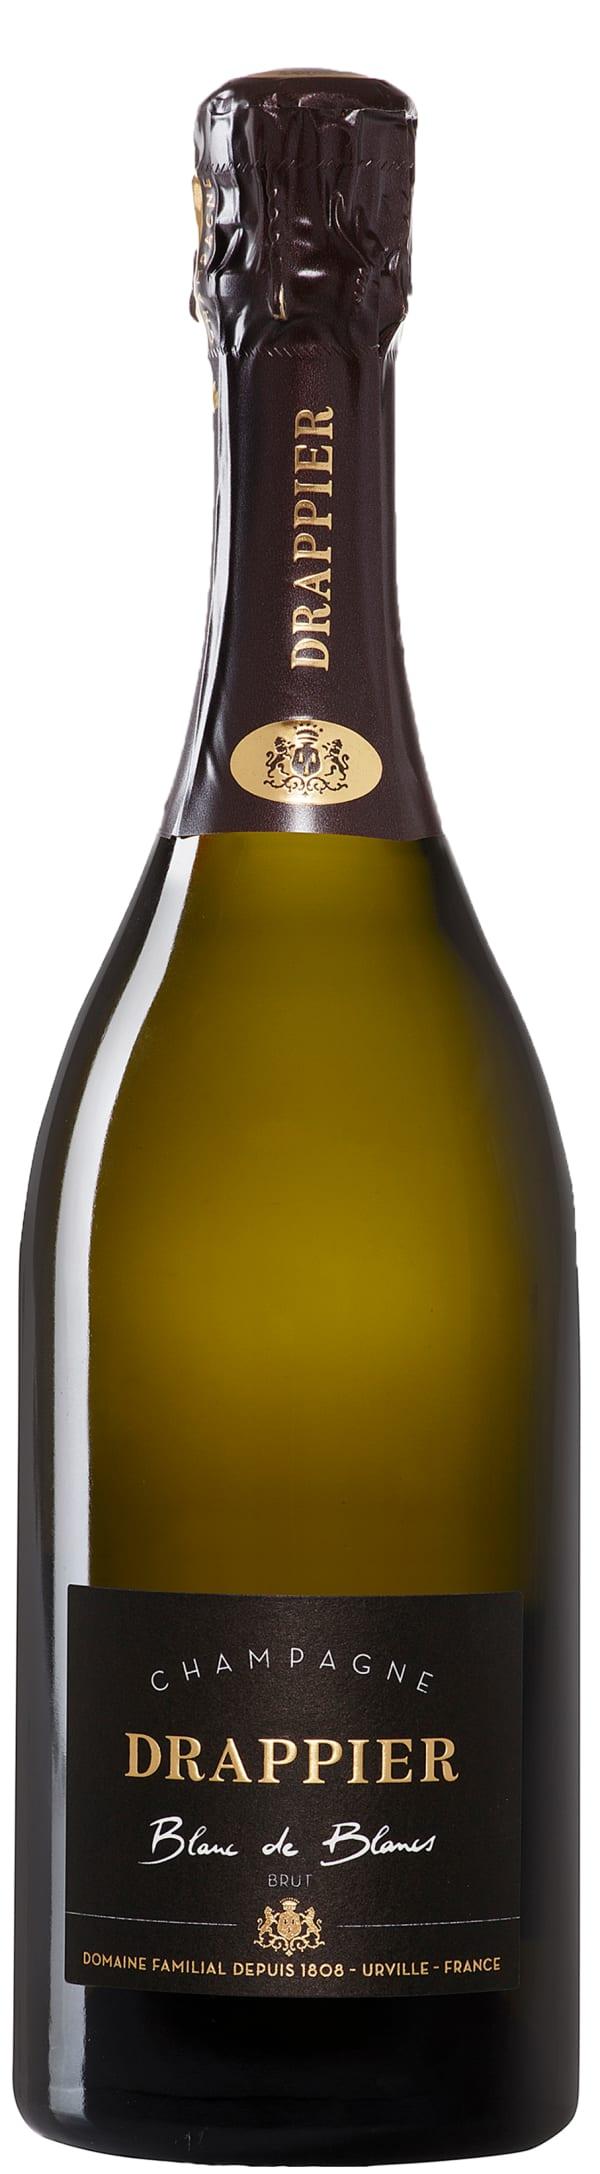 Drappier Blanc de Blancs Champagne Brut